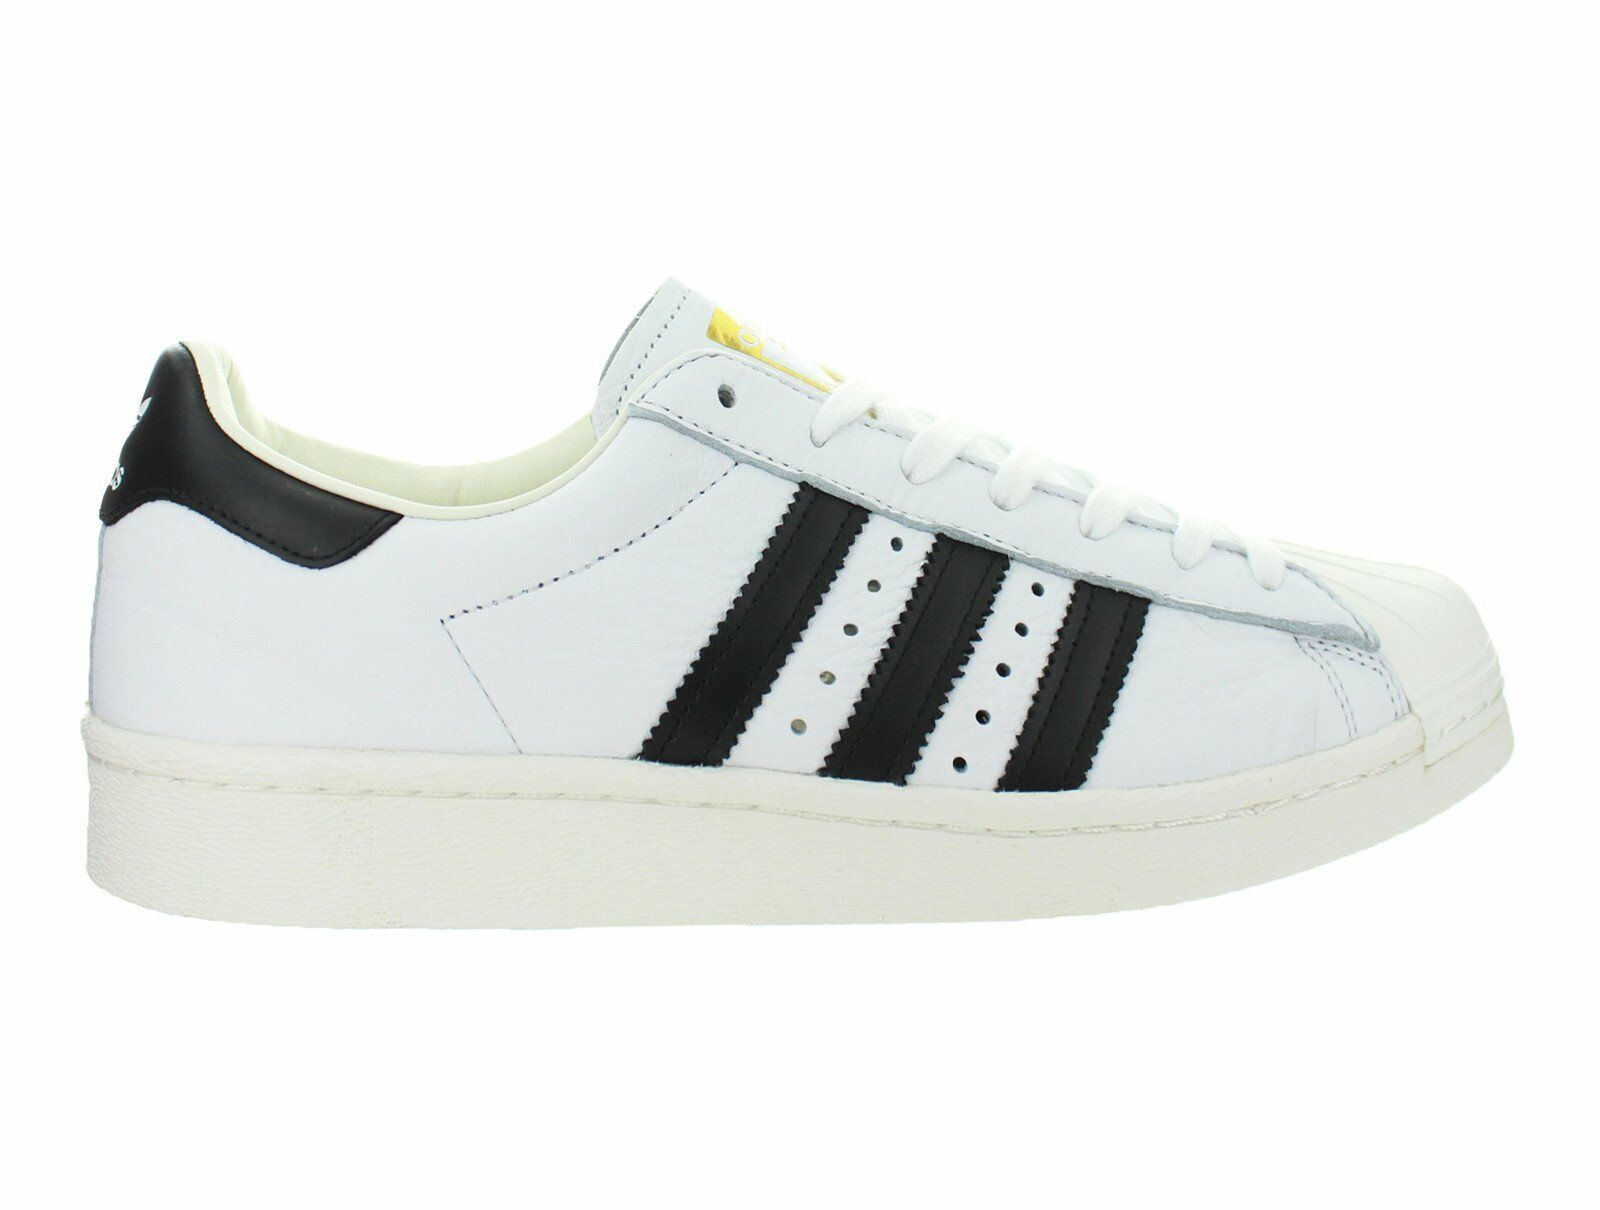 Mens Adidas Superstar Boost White Core Black gold Metallic BB0188